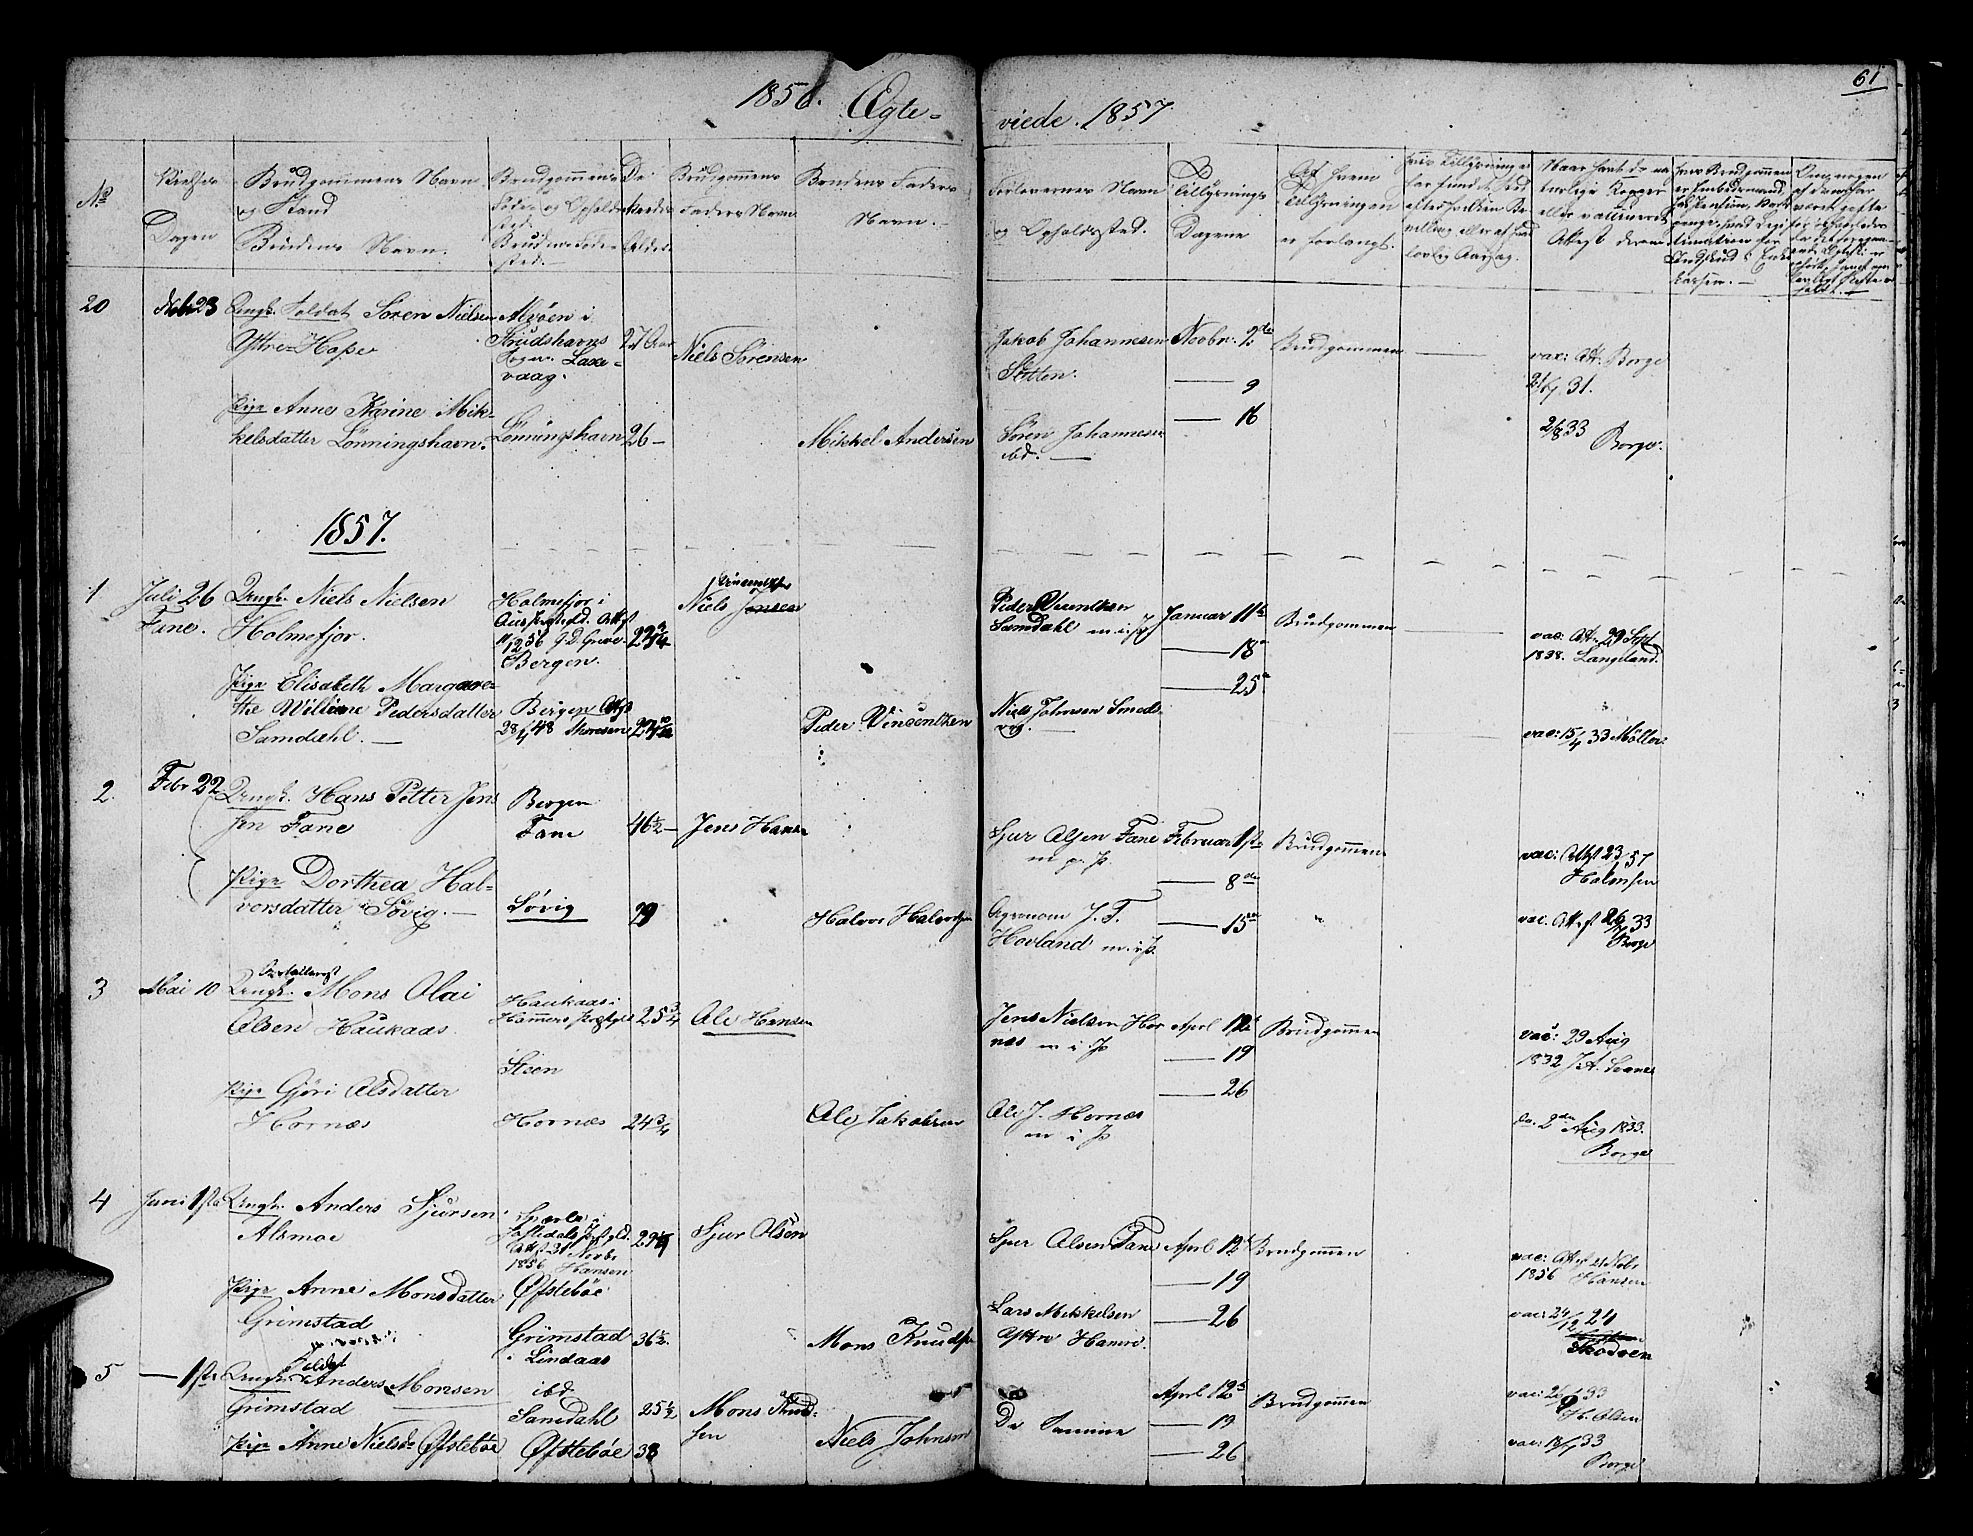 SAB, Fana Sokneprestembete, H/Hab/Habb/L0002: Klokkerbok nr. B 2, 1851-1860, s. 61